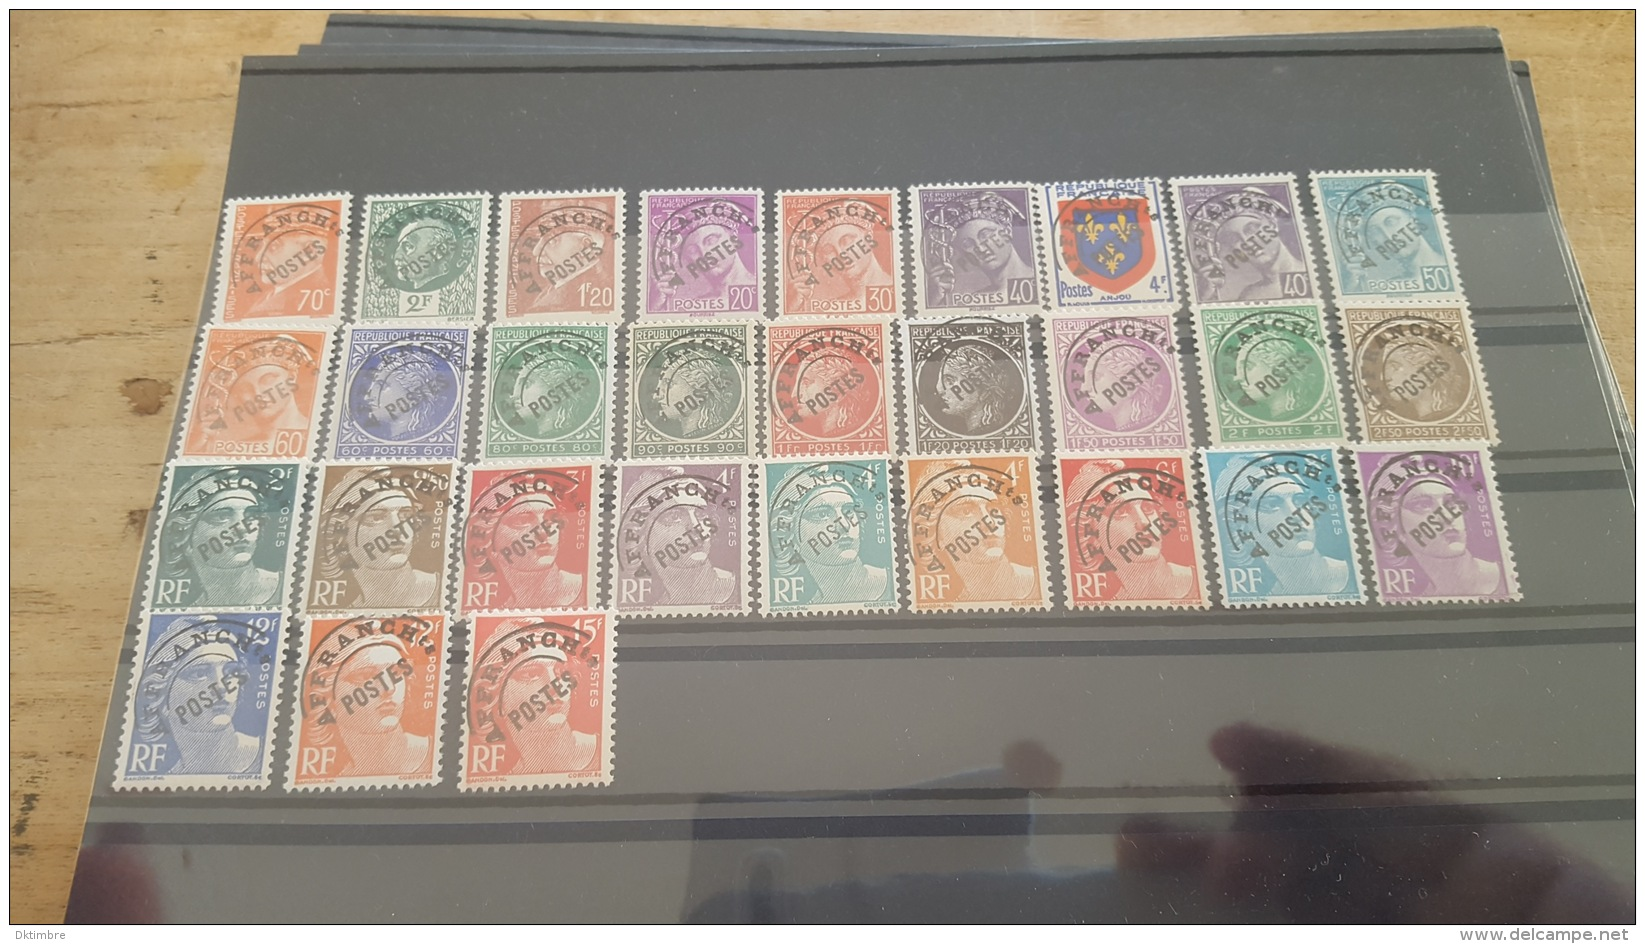 LOT 375979 TIMBRE DE FRANCE NEUF* BLOC - Collections